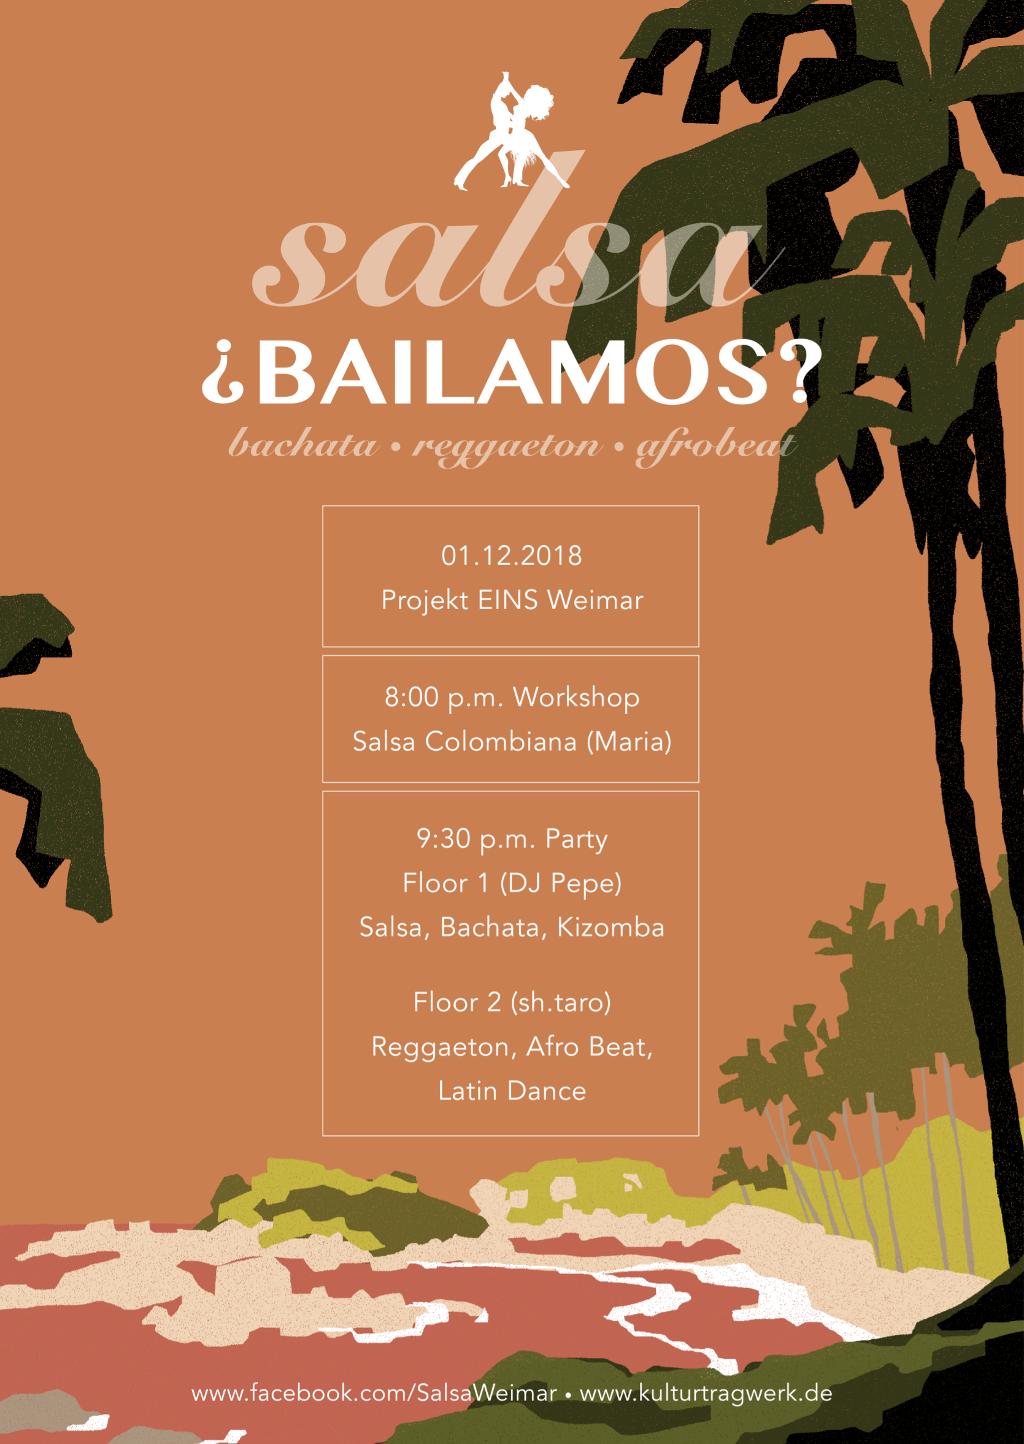 ¿Bailamos? Salsa, Bachata, Reggaeton, Afrobeat & Latin Dance